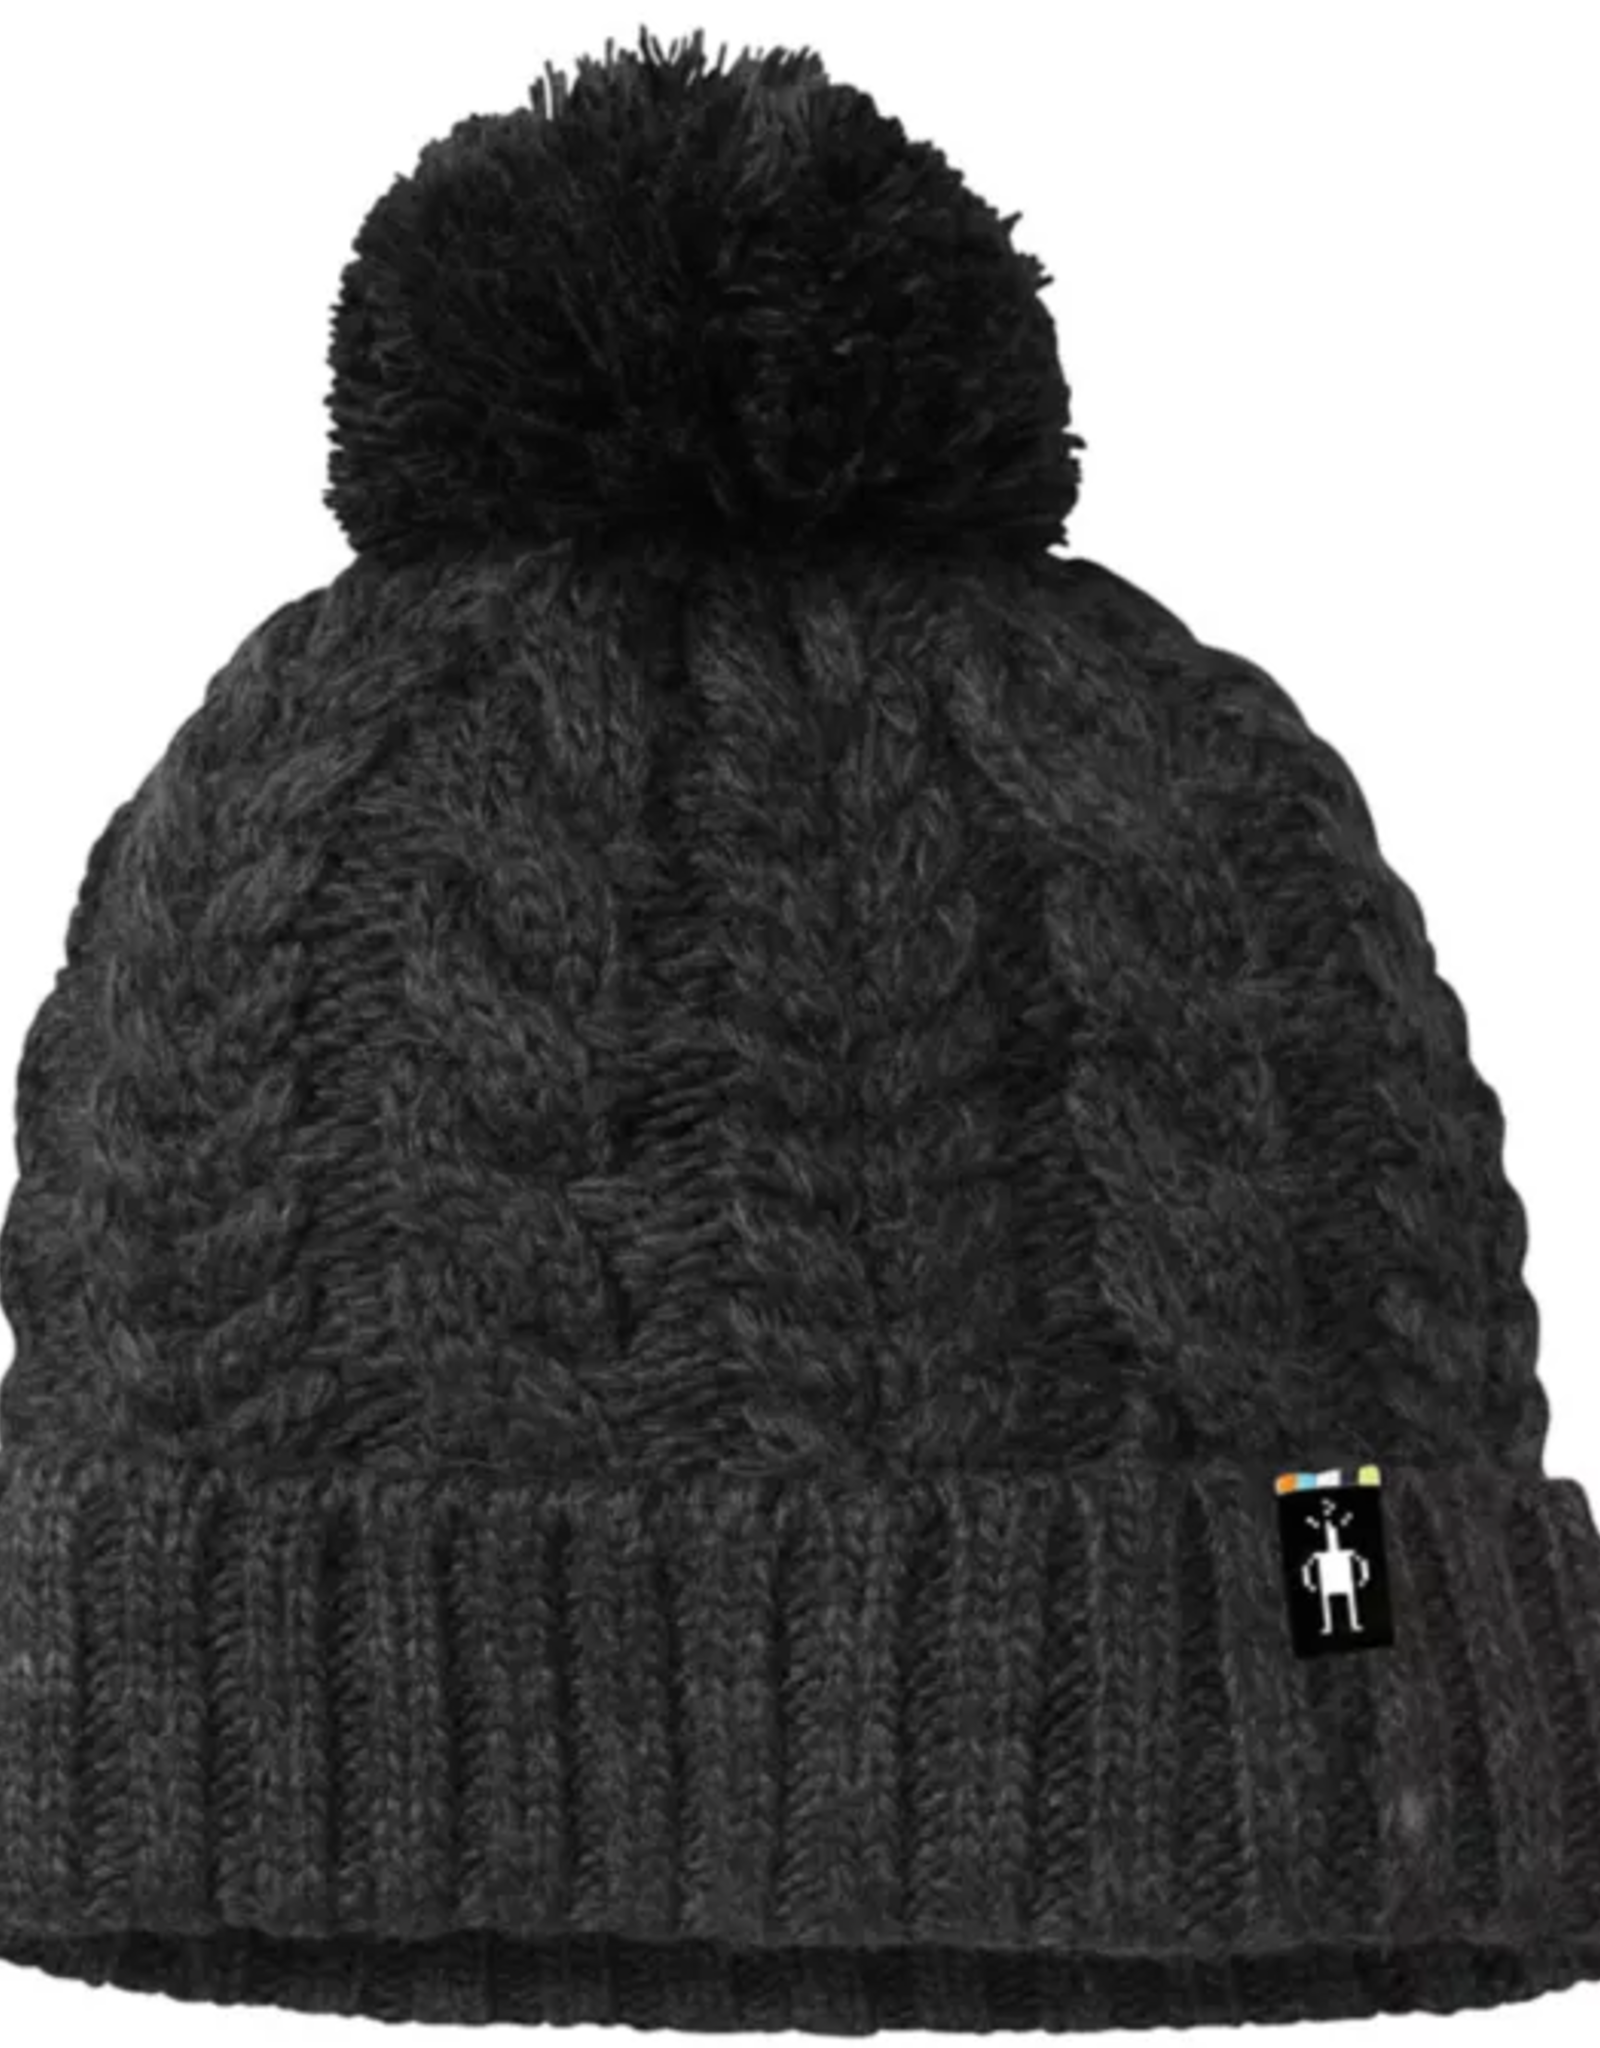 Smartwool Smartwool Ski Town Hat